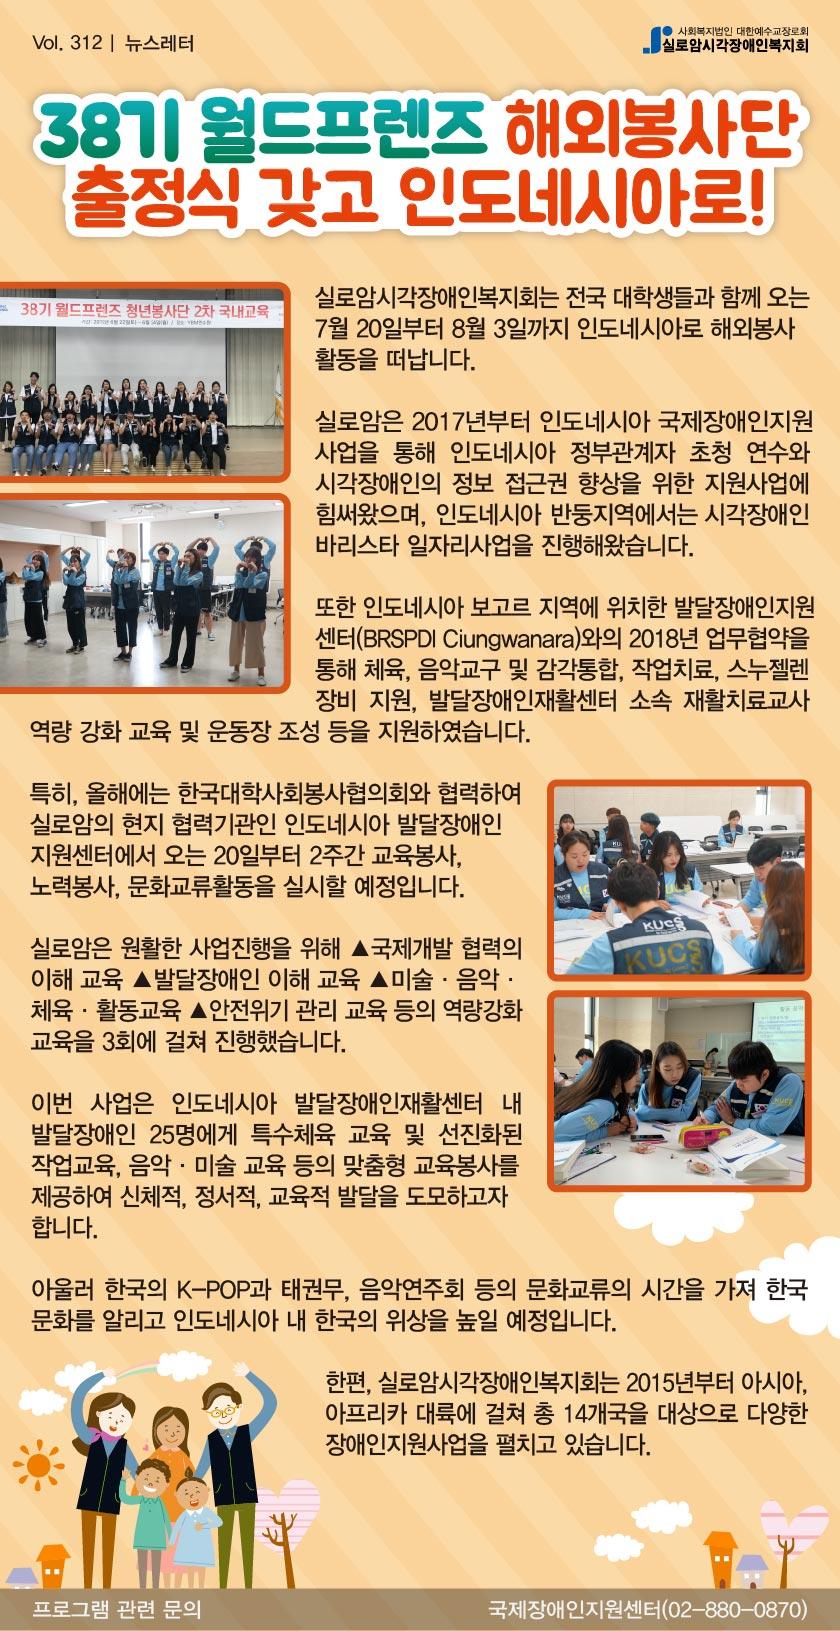 Vol.312 38기 월드프렌즈 해외봉사단 출정식 갖고 인도네시아로 썸네일